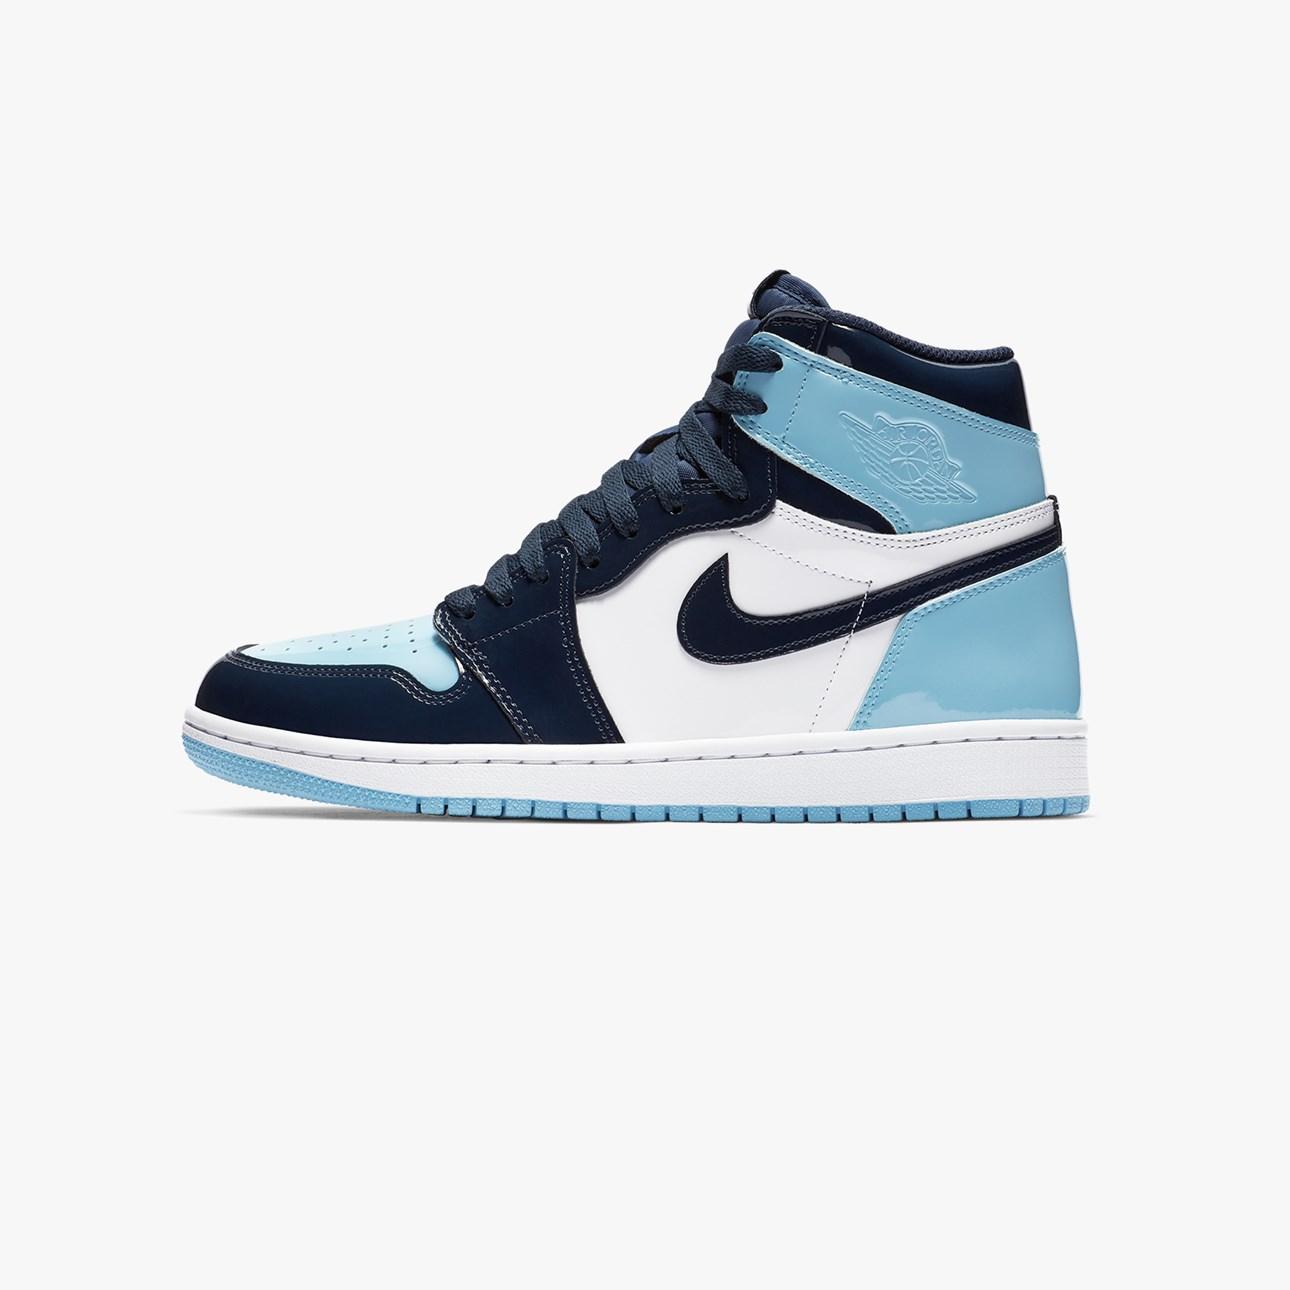 Kaufe eins bekomme eins Nike Air Jordan waren bereits im The